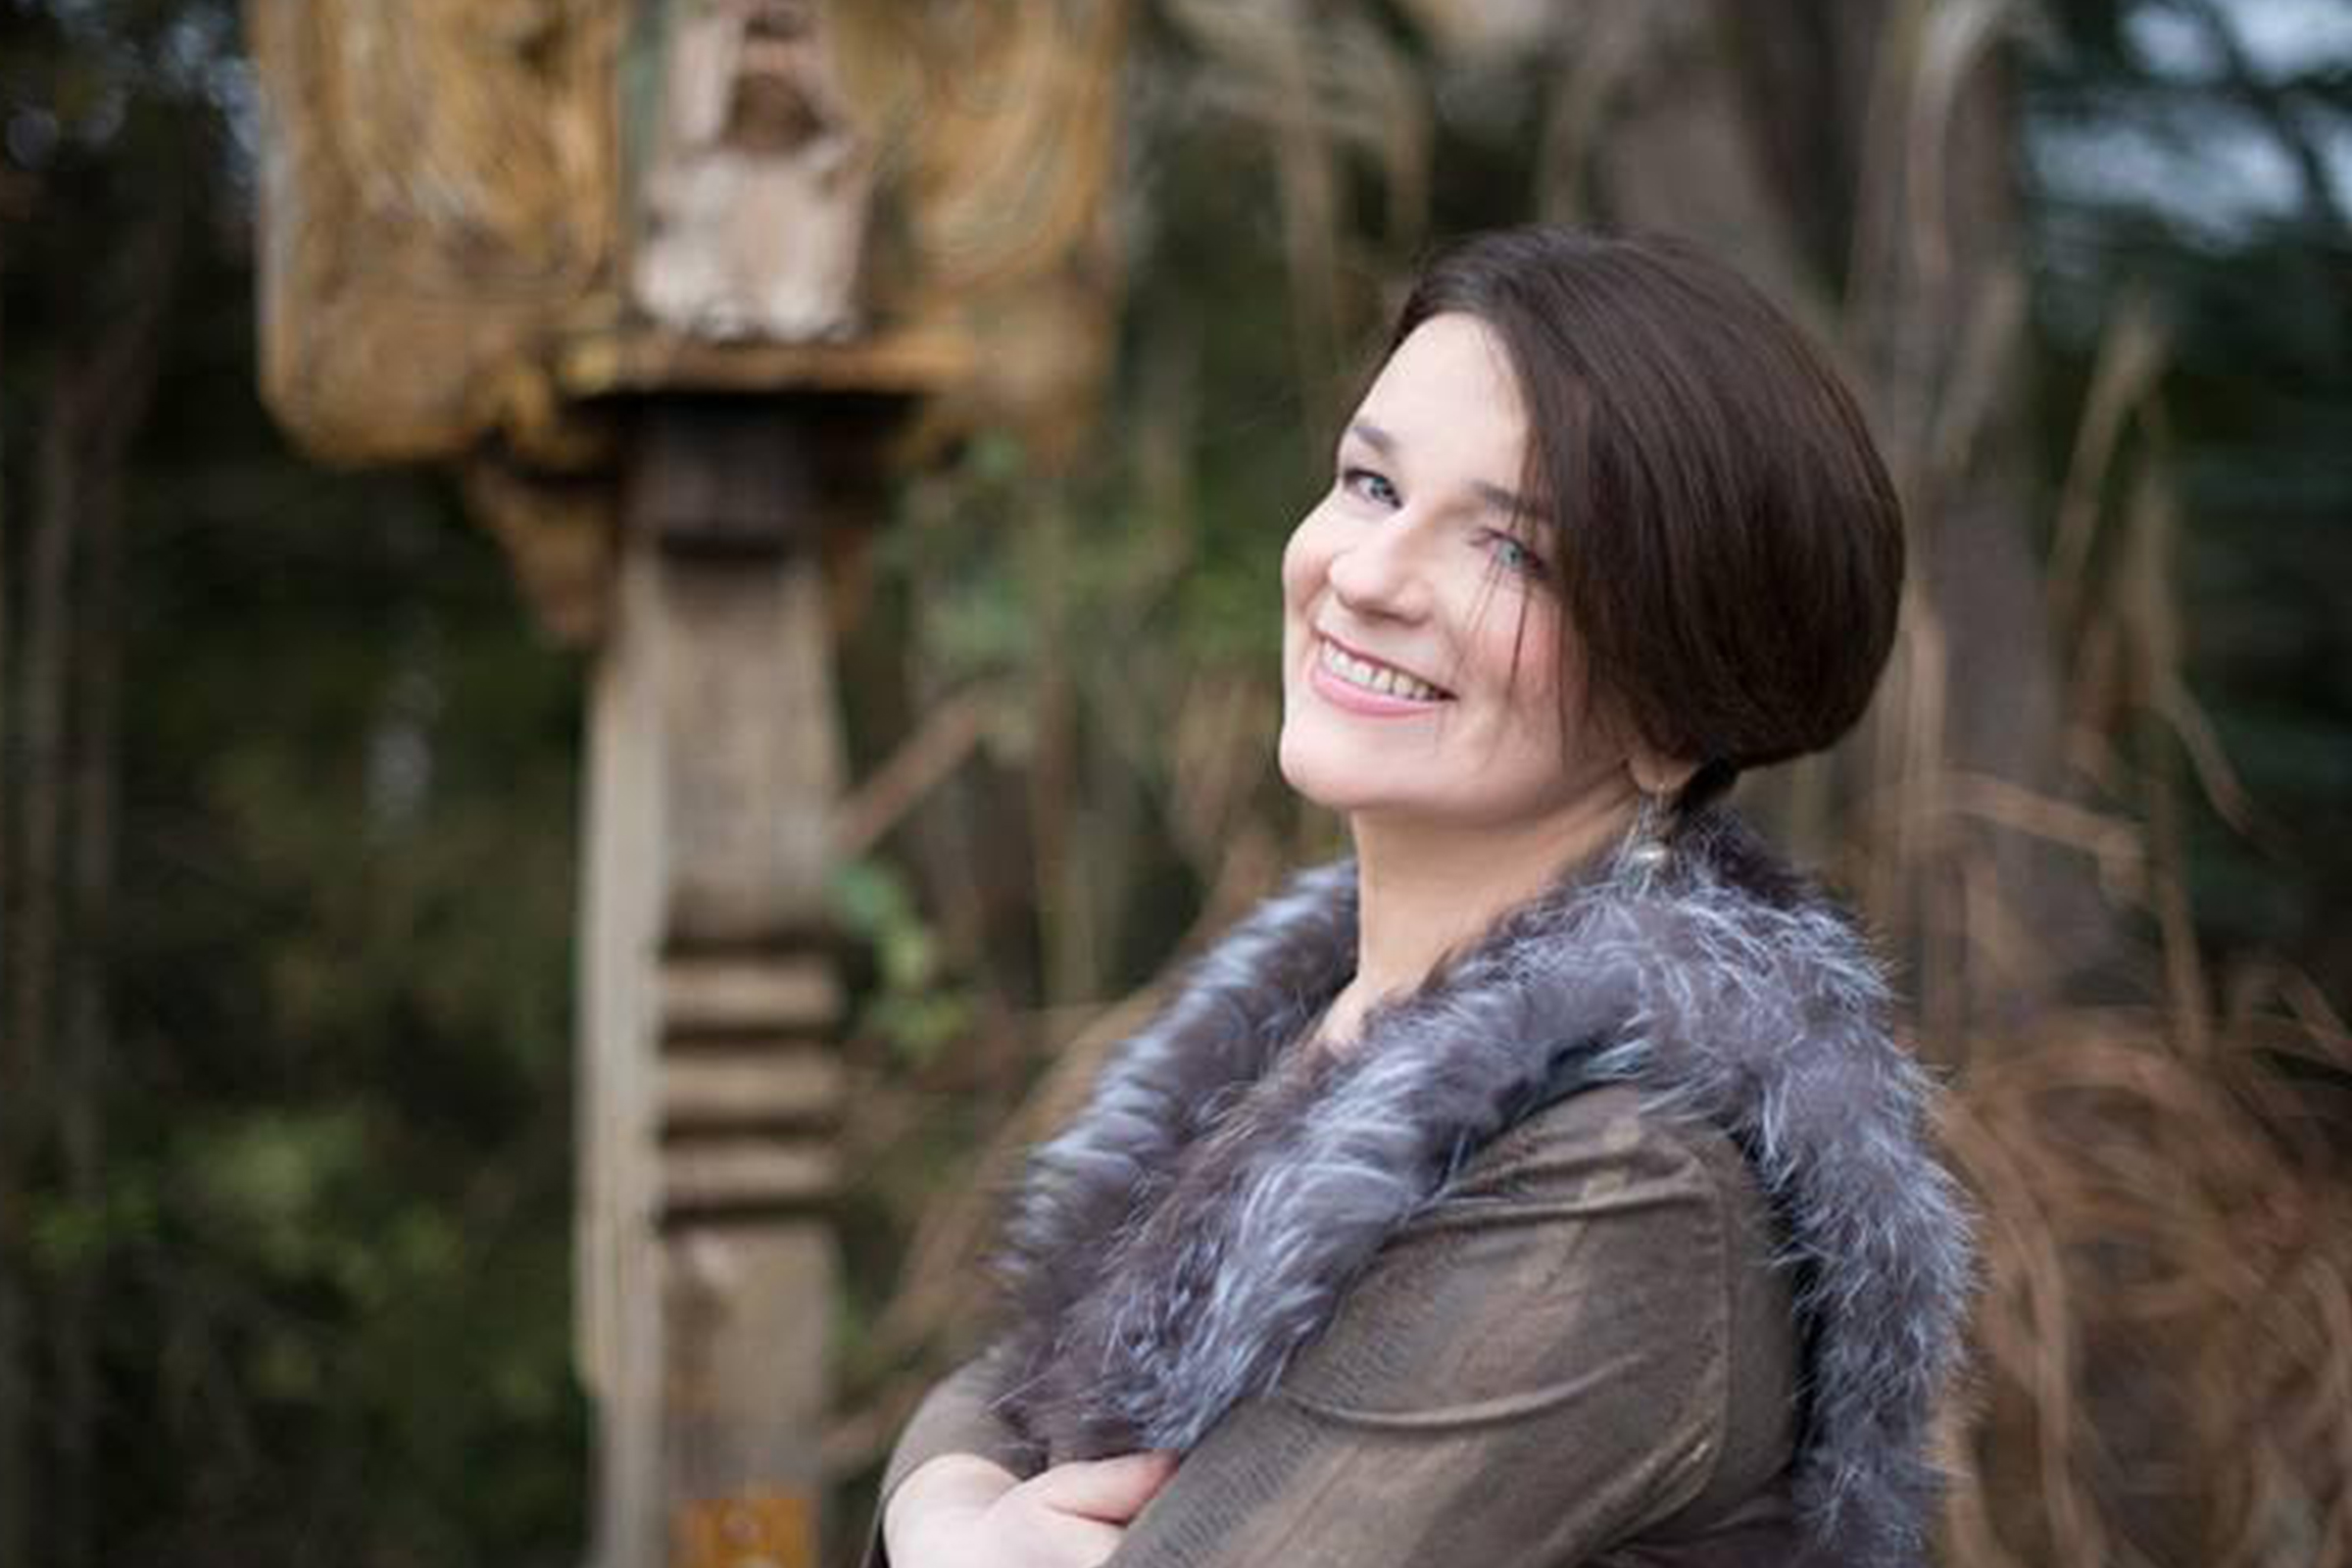 Beata Jakoniuk-Wojcieszak